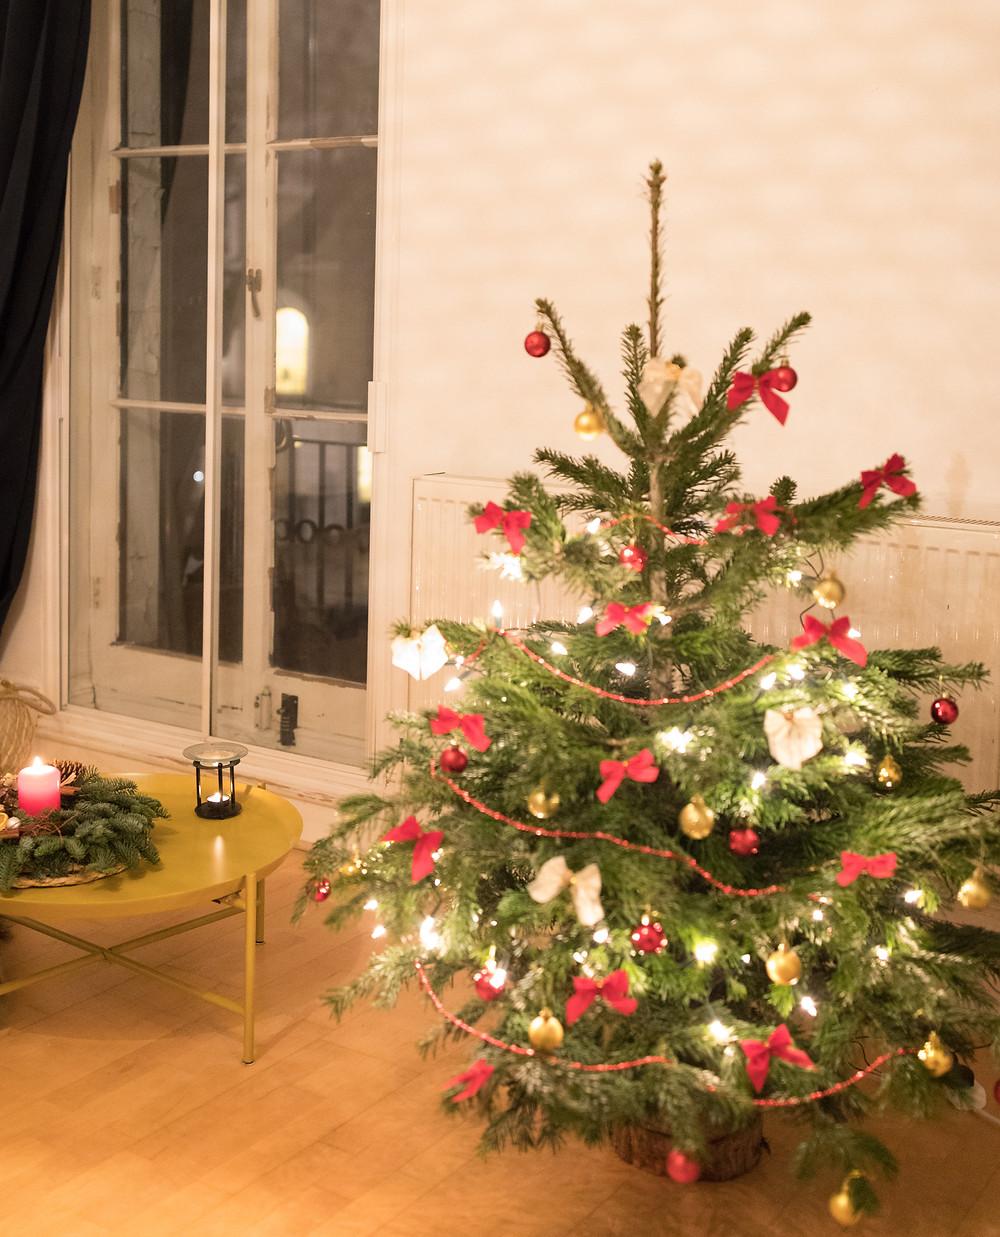 My very first Christmas tree